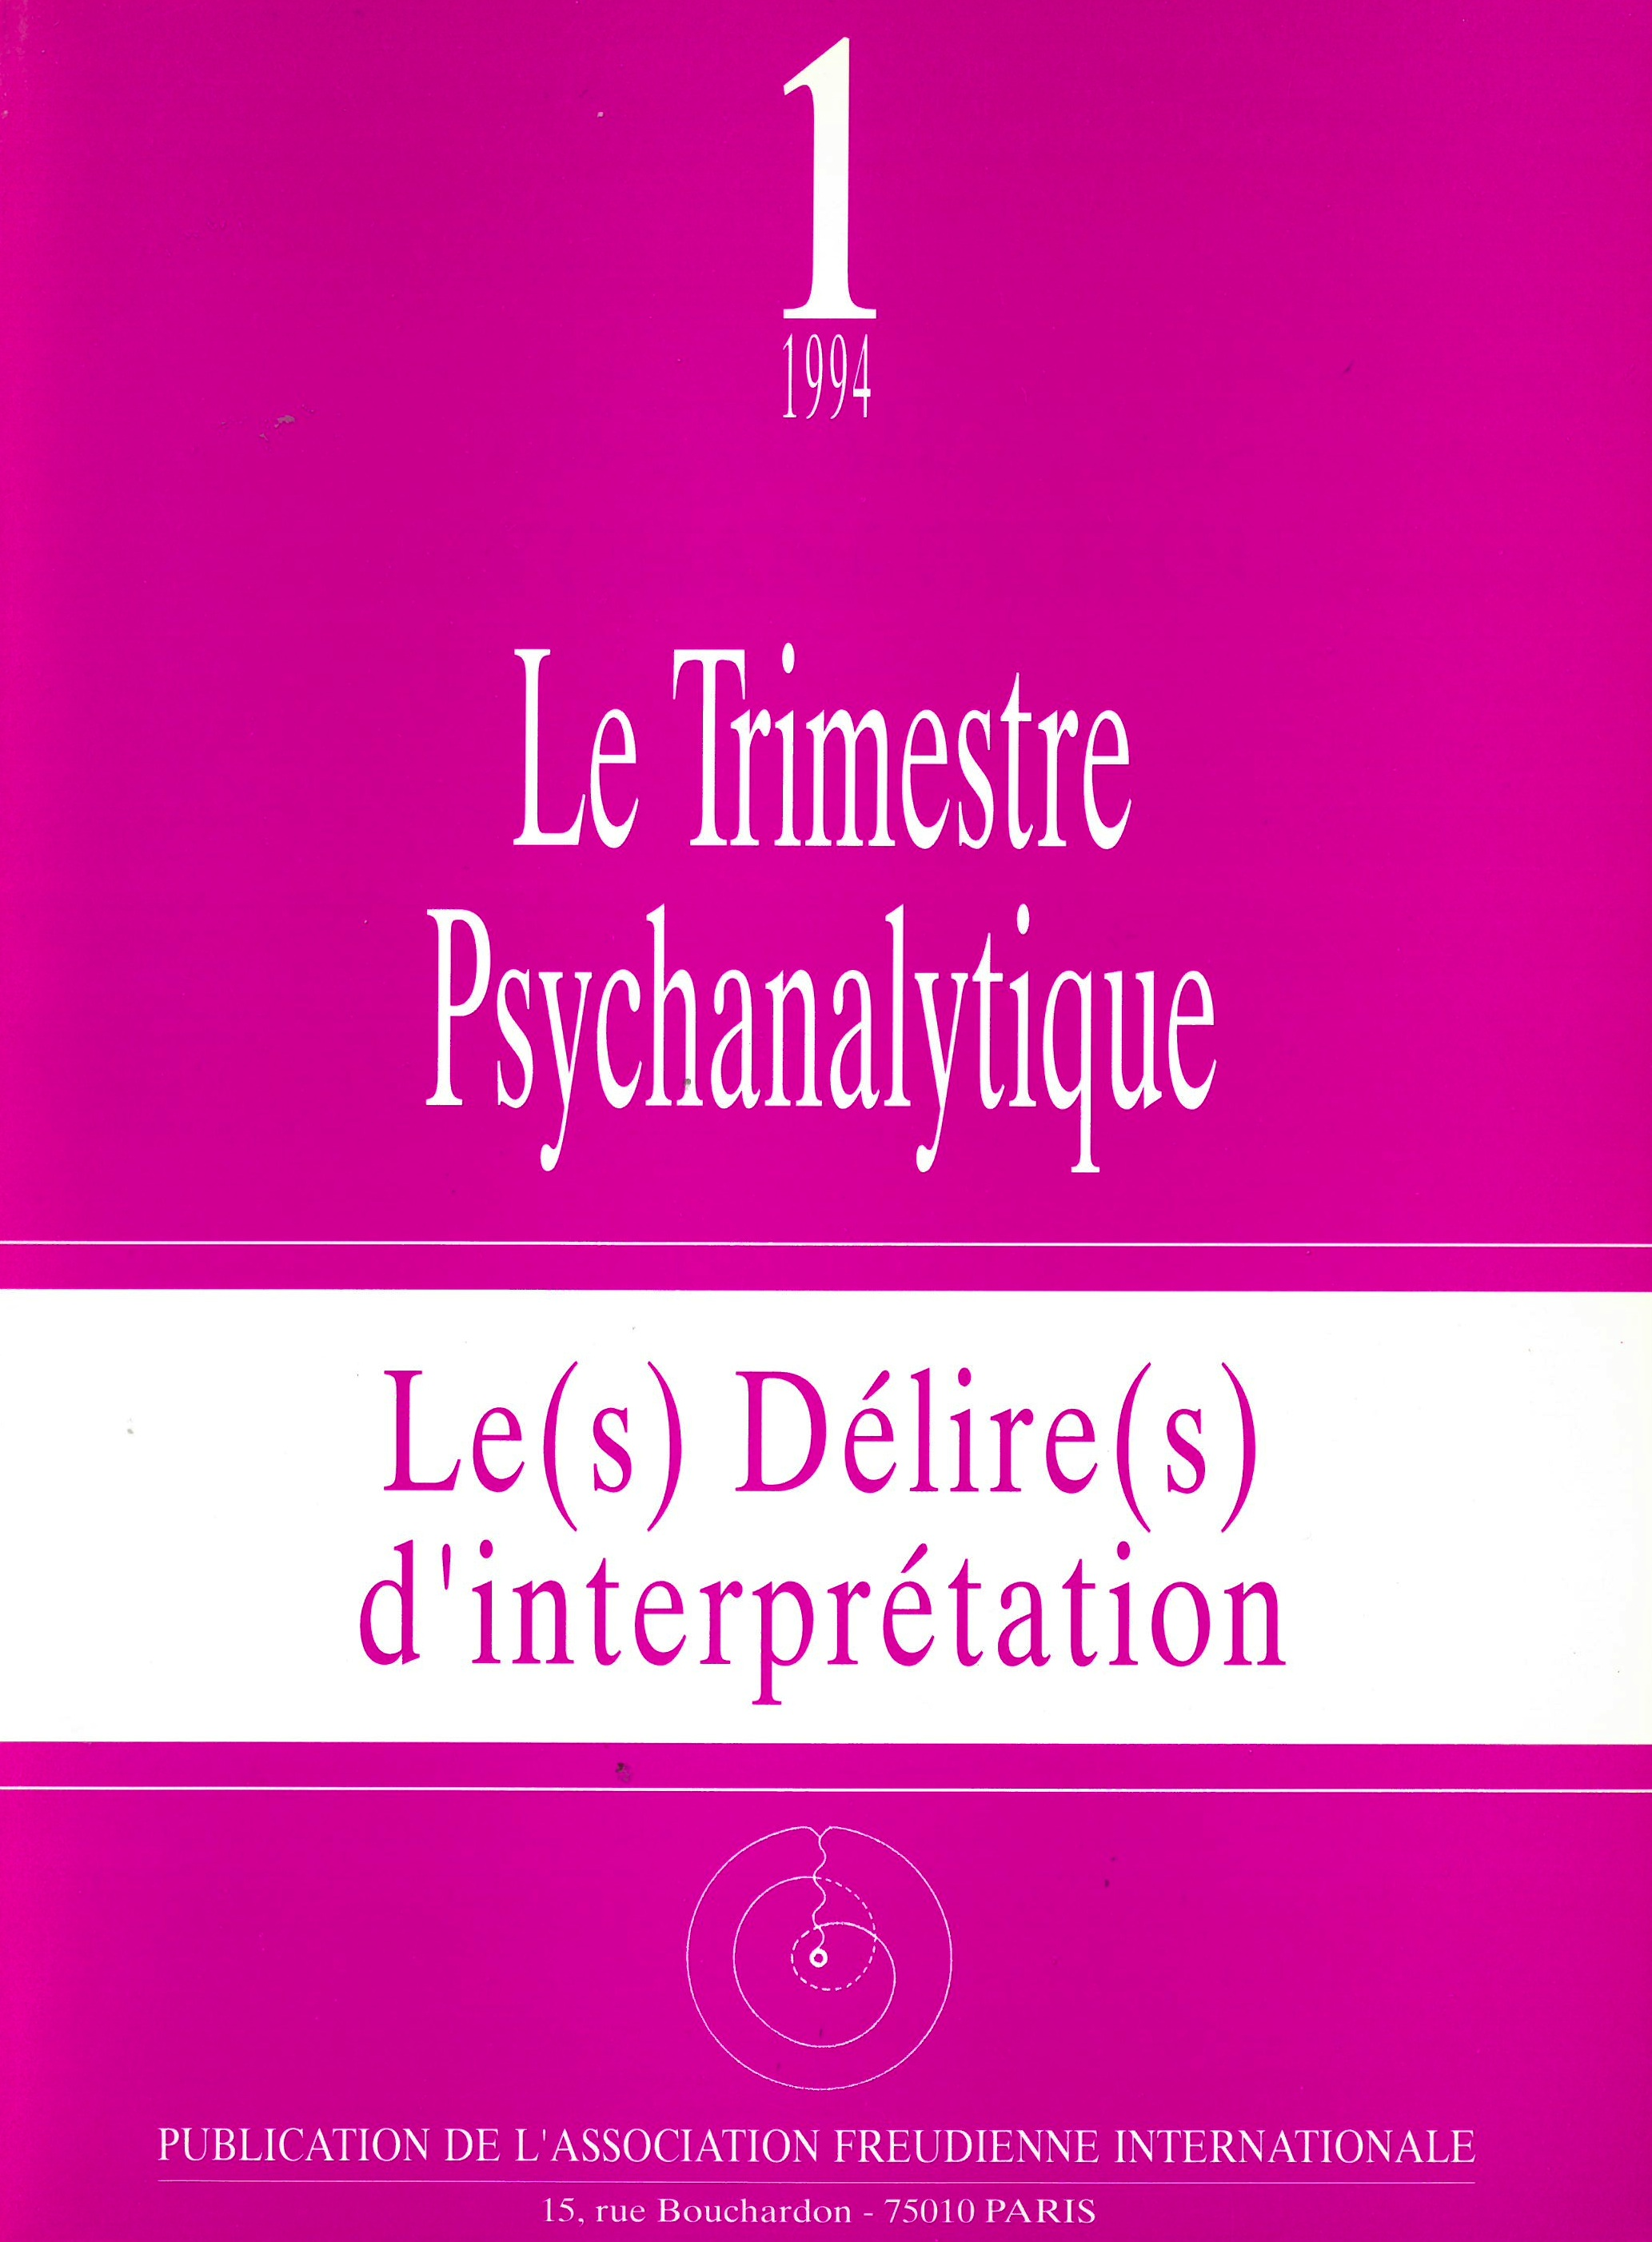 Freud-Lacan - Consultation document